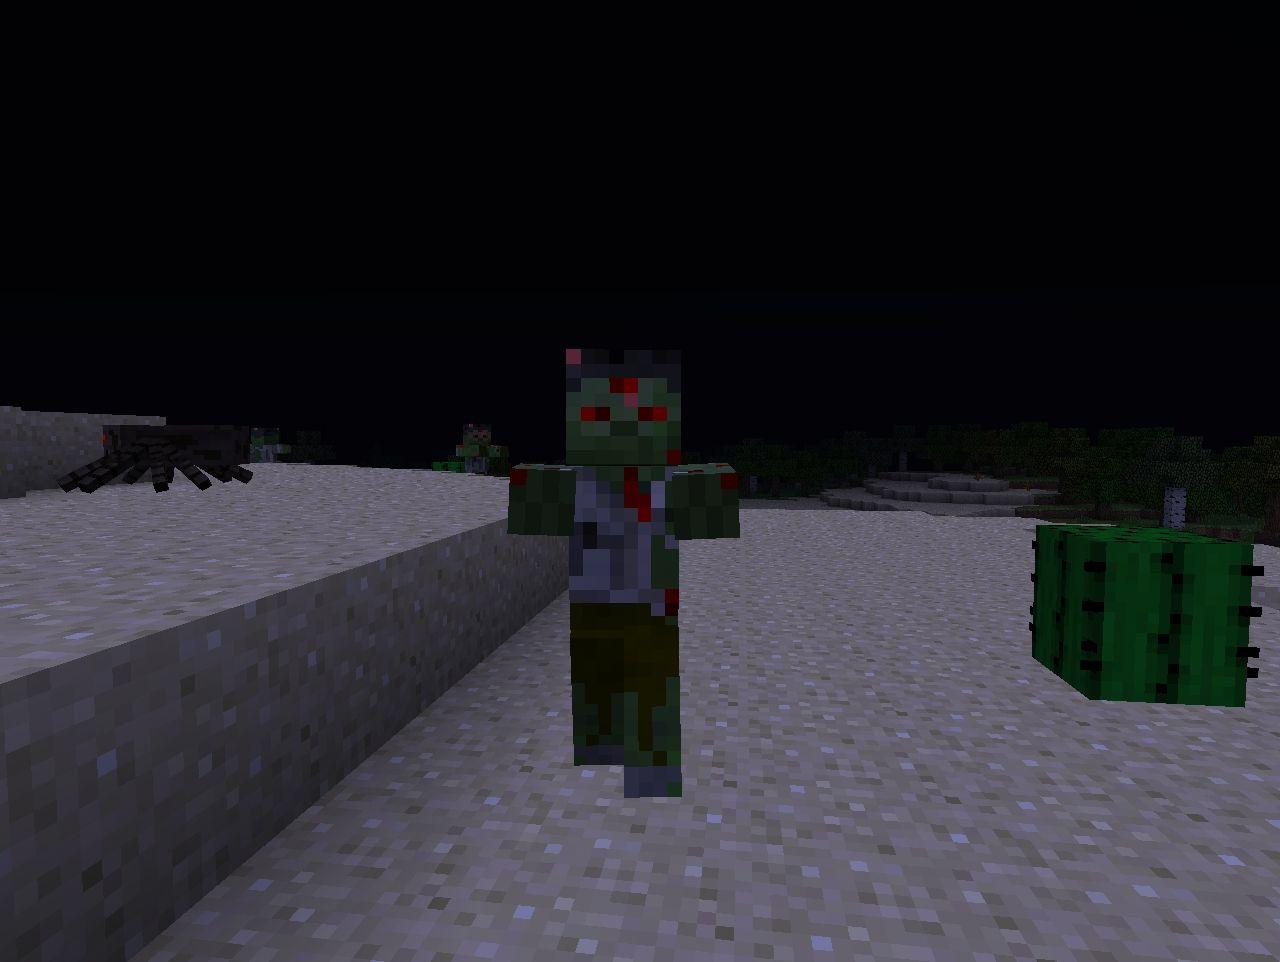 Skin edits (Mobs) Minecraft Texture Pack